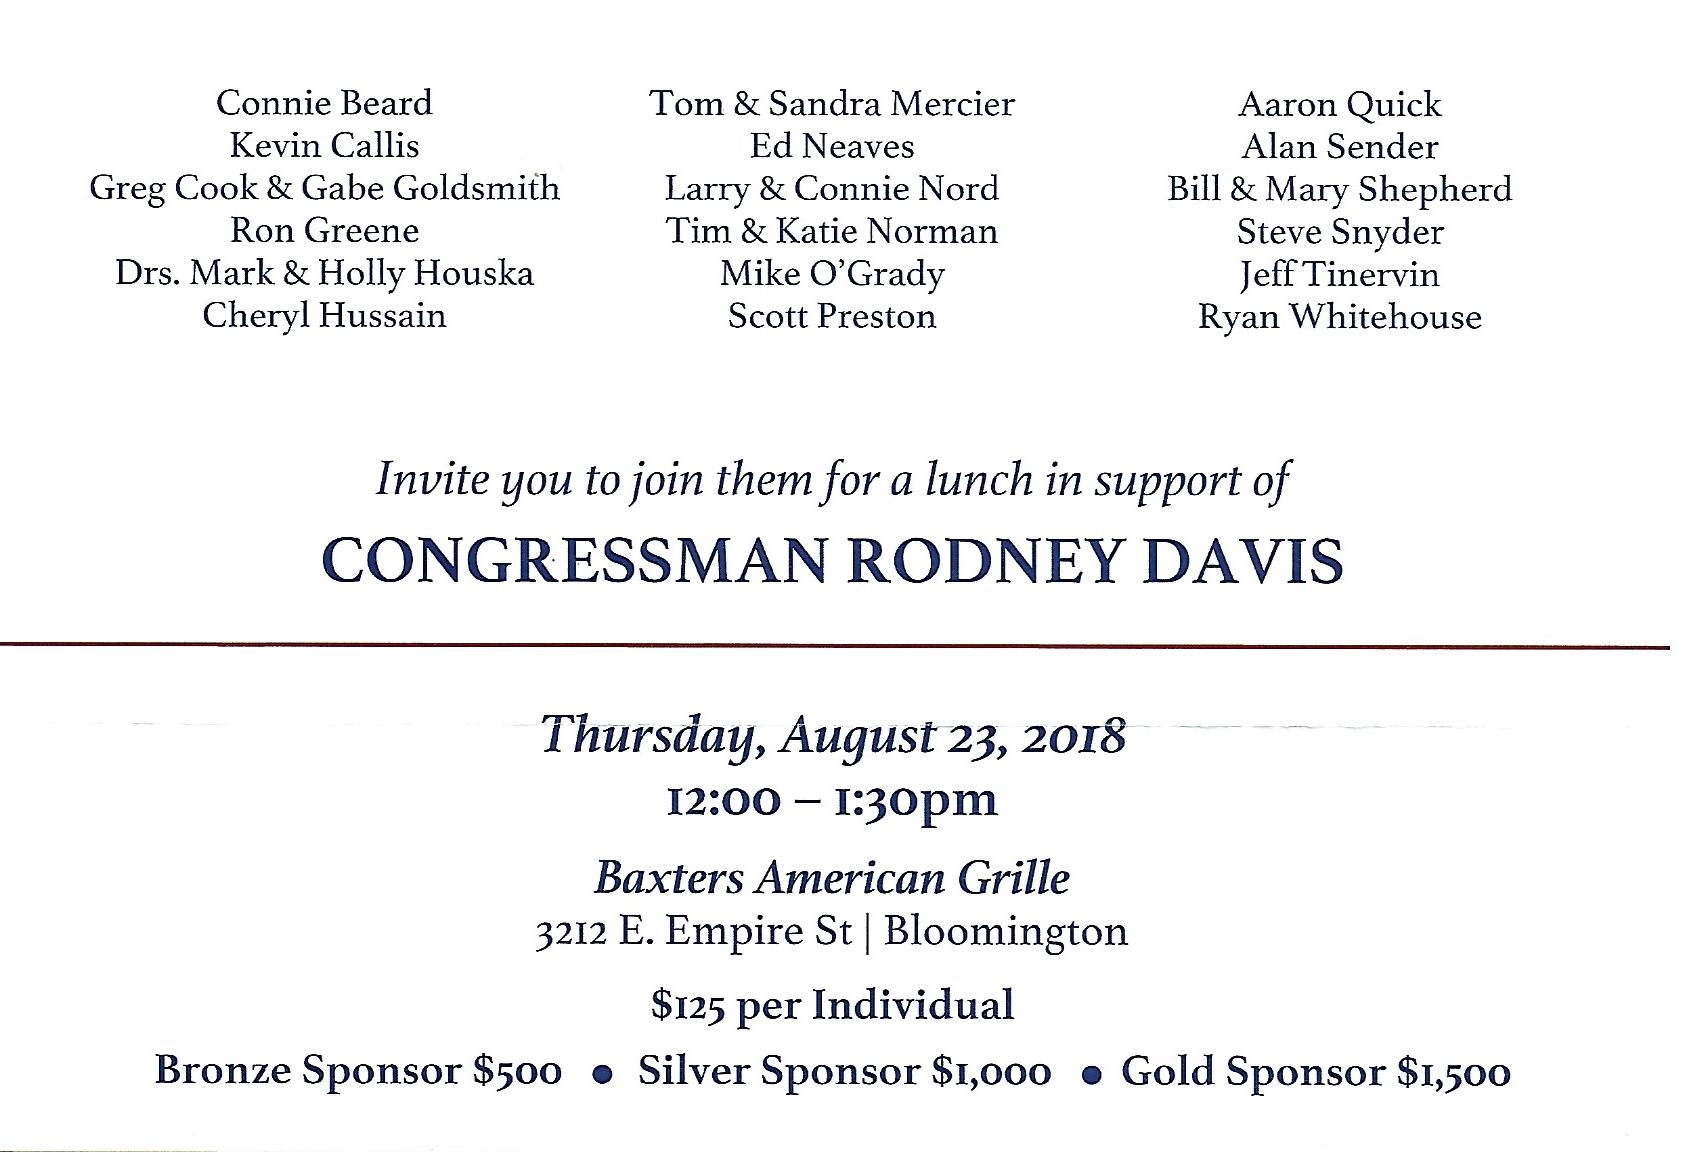 Rodney Davis Fundraiser